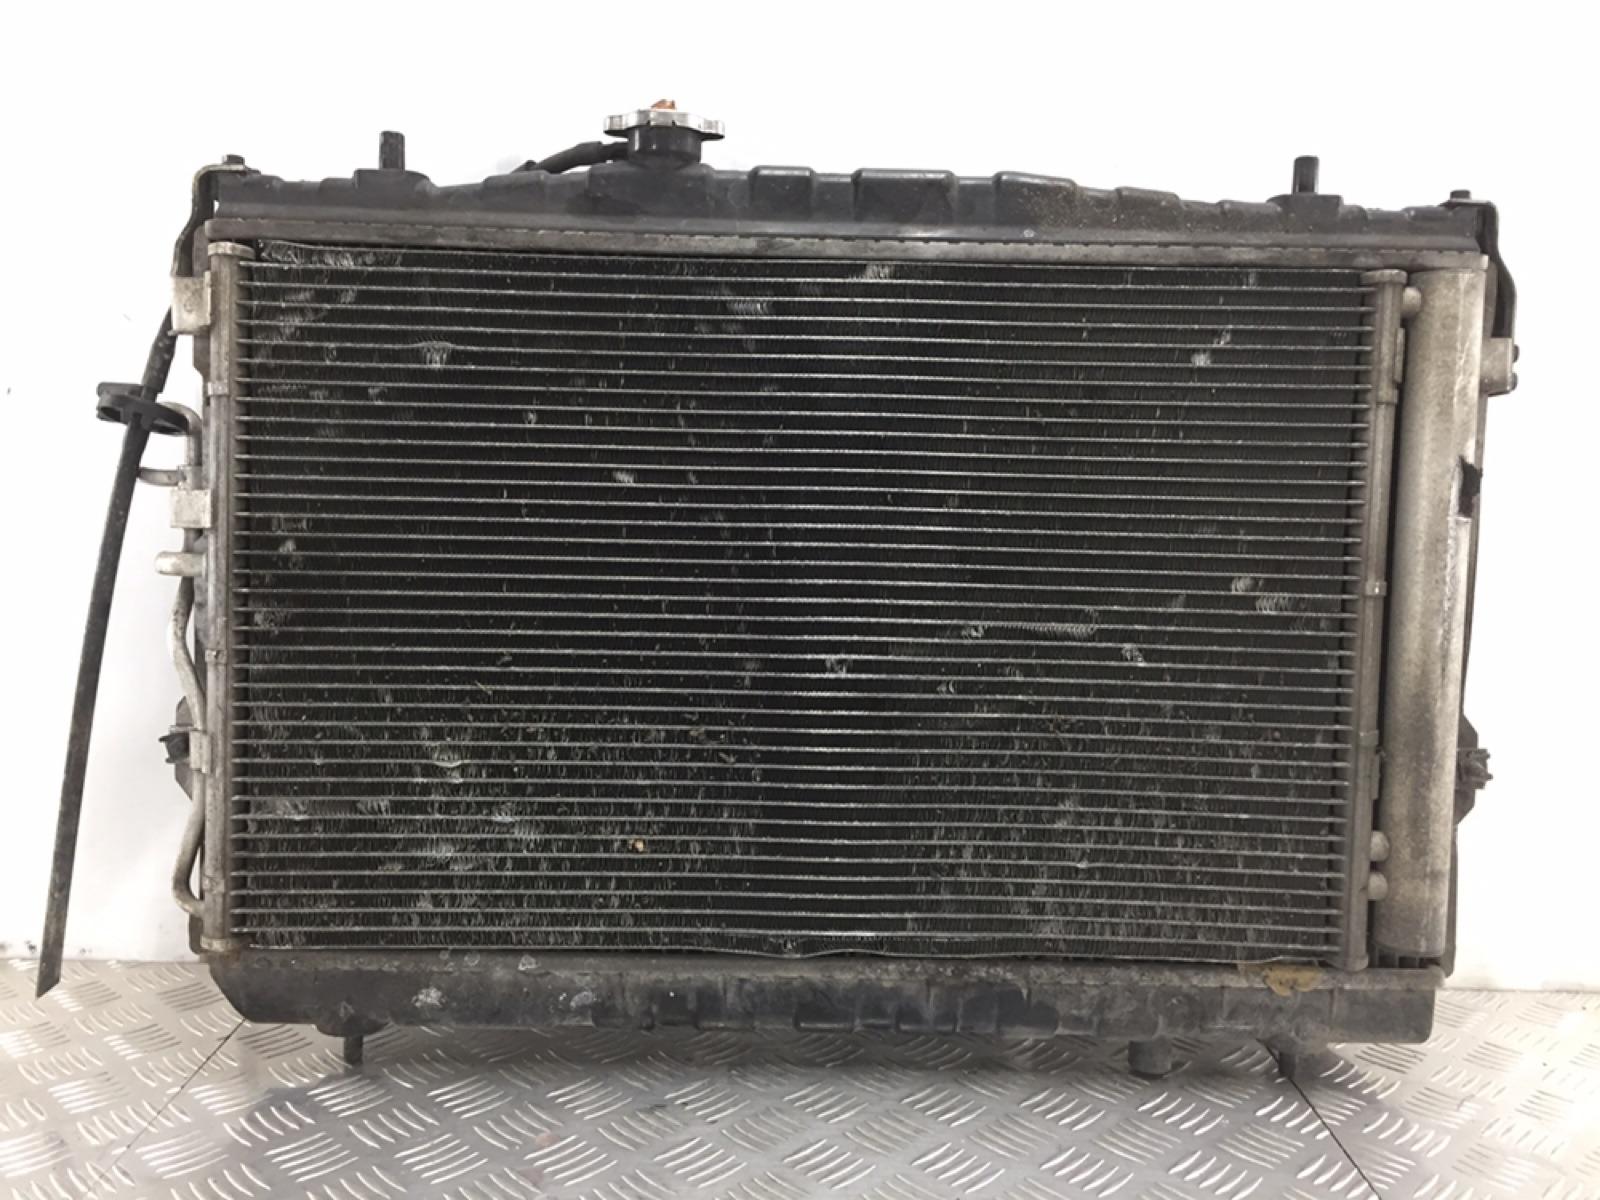 Кассета радиаторов Hyundai Coupe 2.0 I 2009 (б/у)